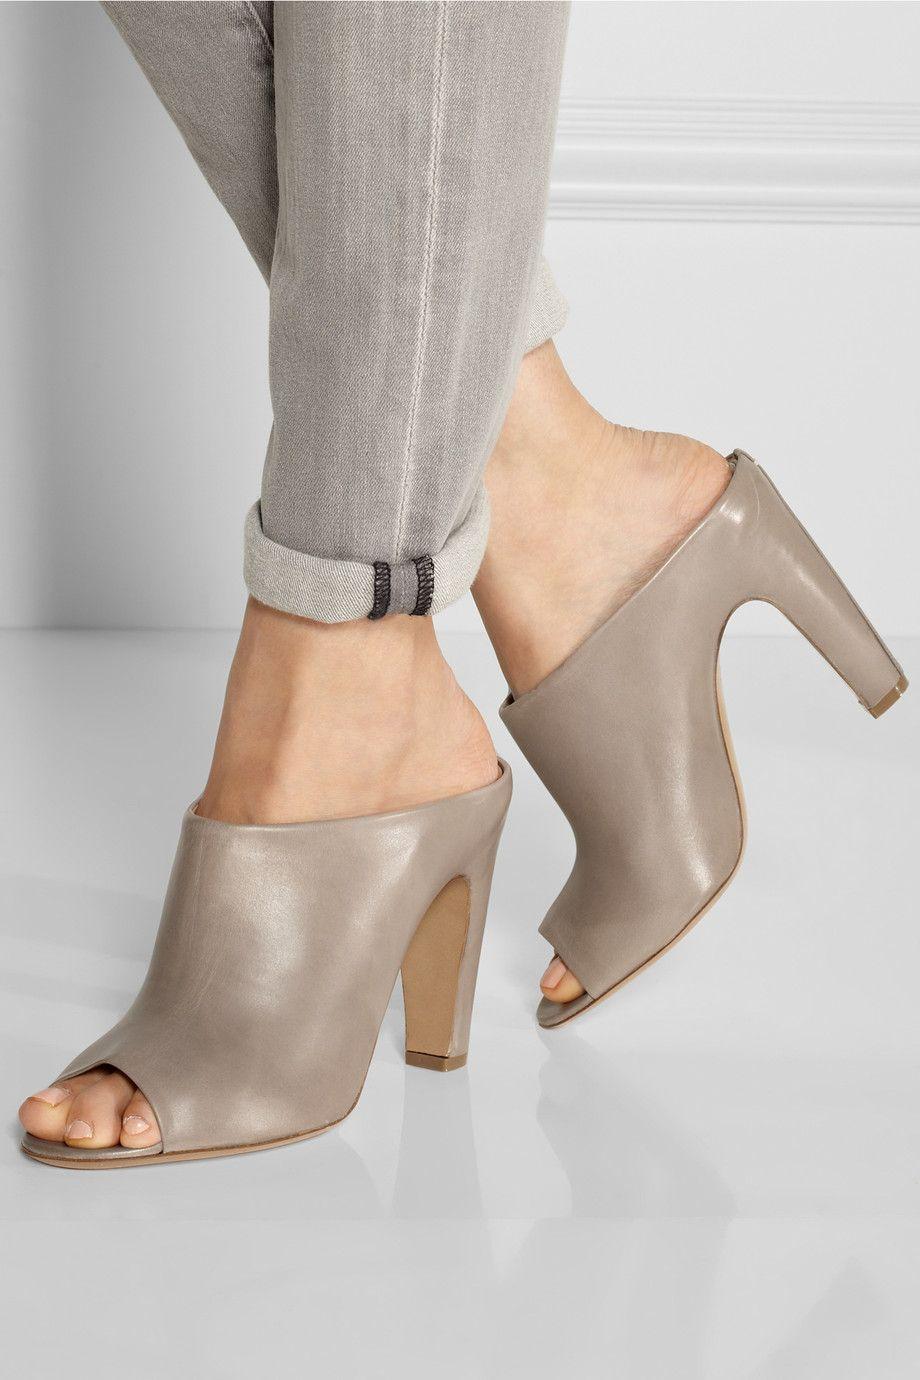 Footwear - Mules Maison Martin Margiela p3gJVrHn5W